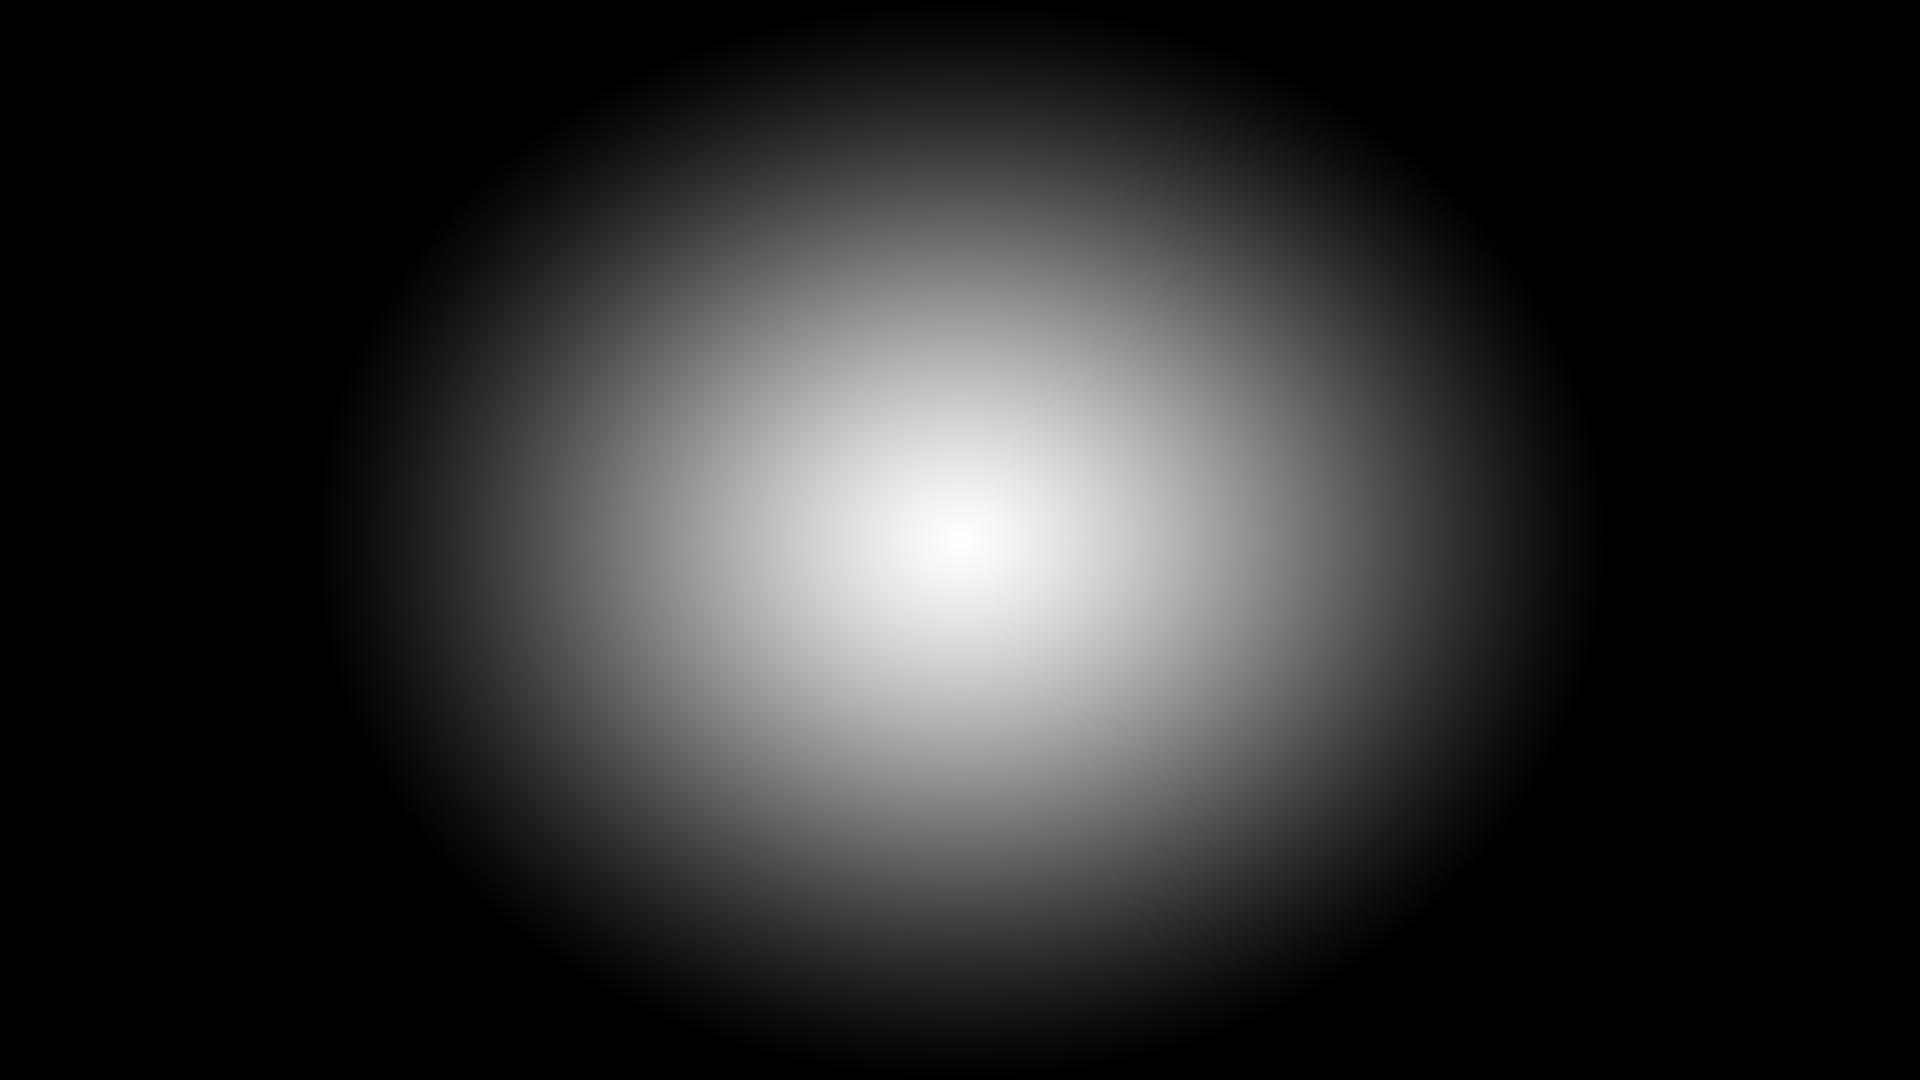 dissolvetheworld_part02_04_screenspacemask